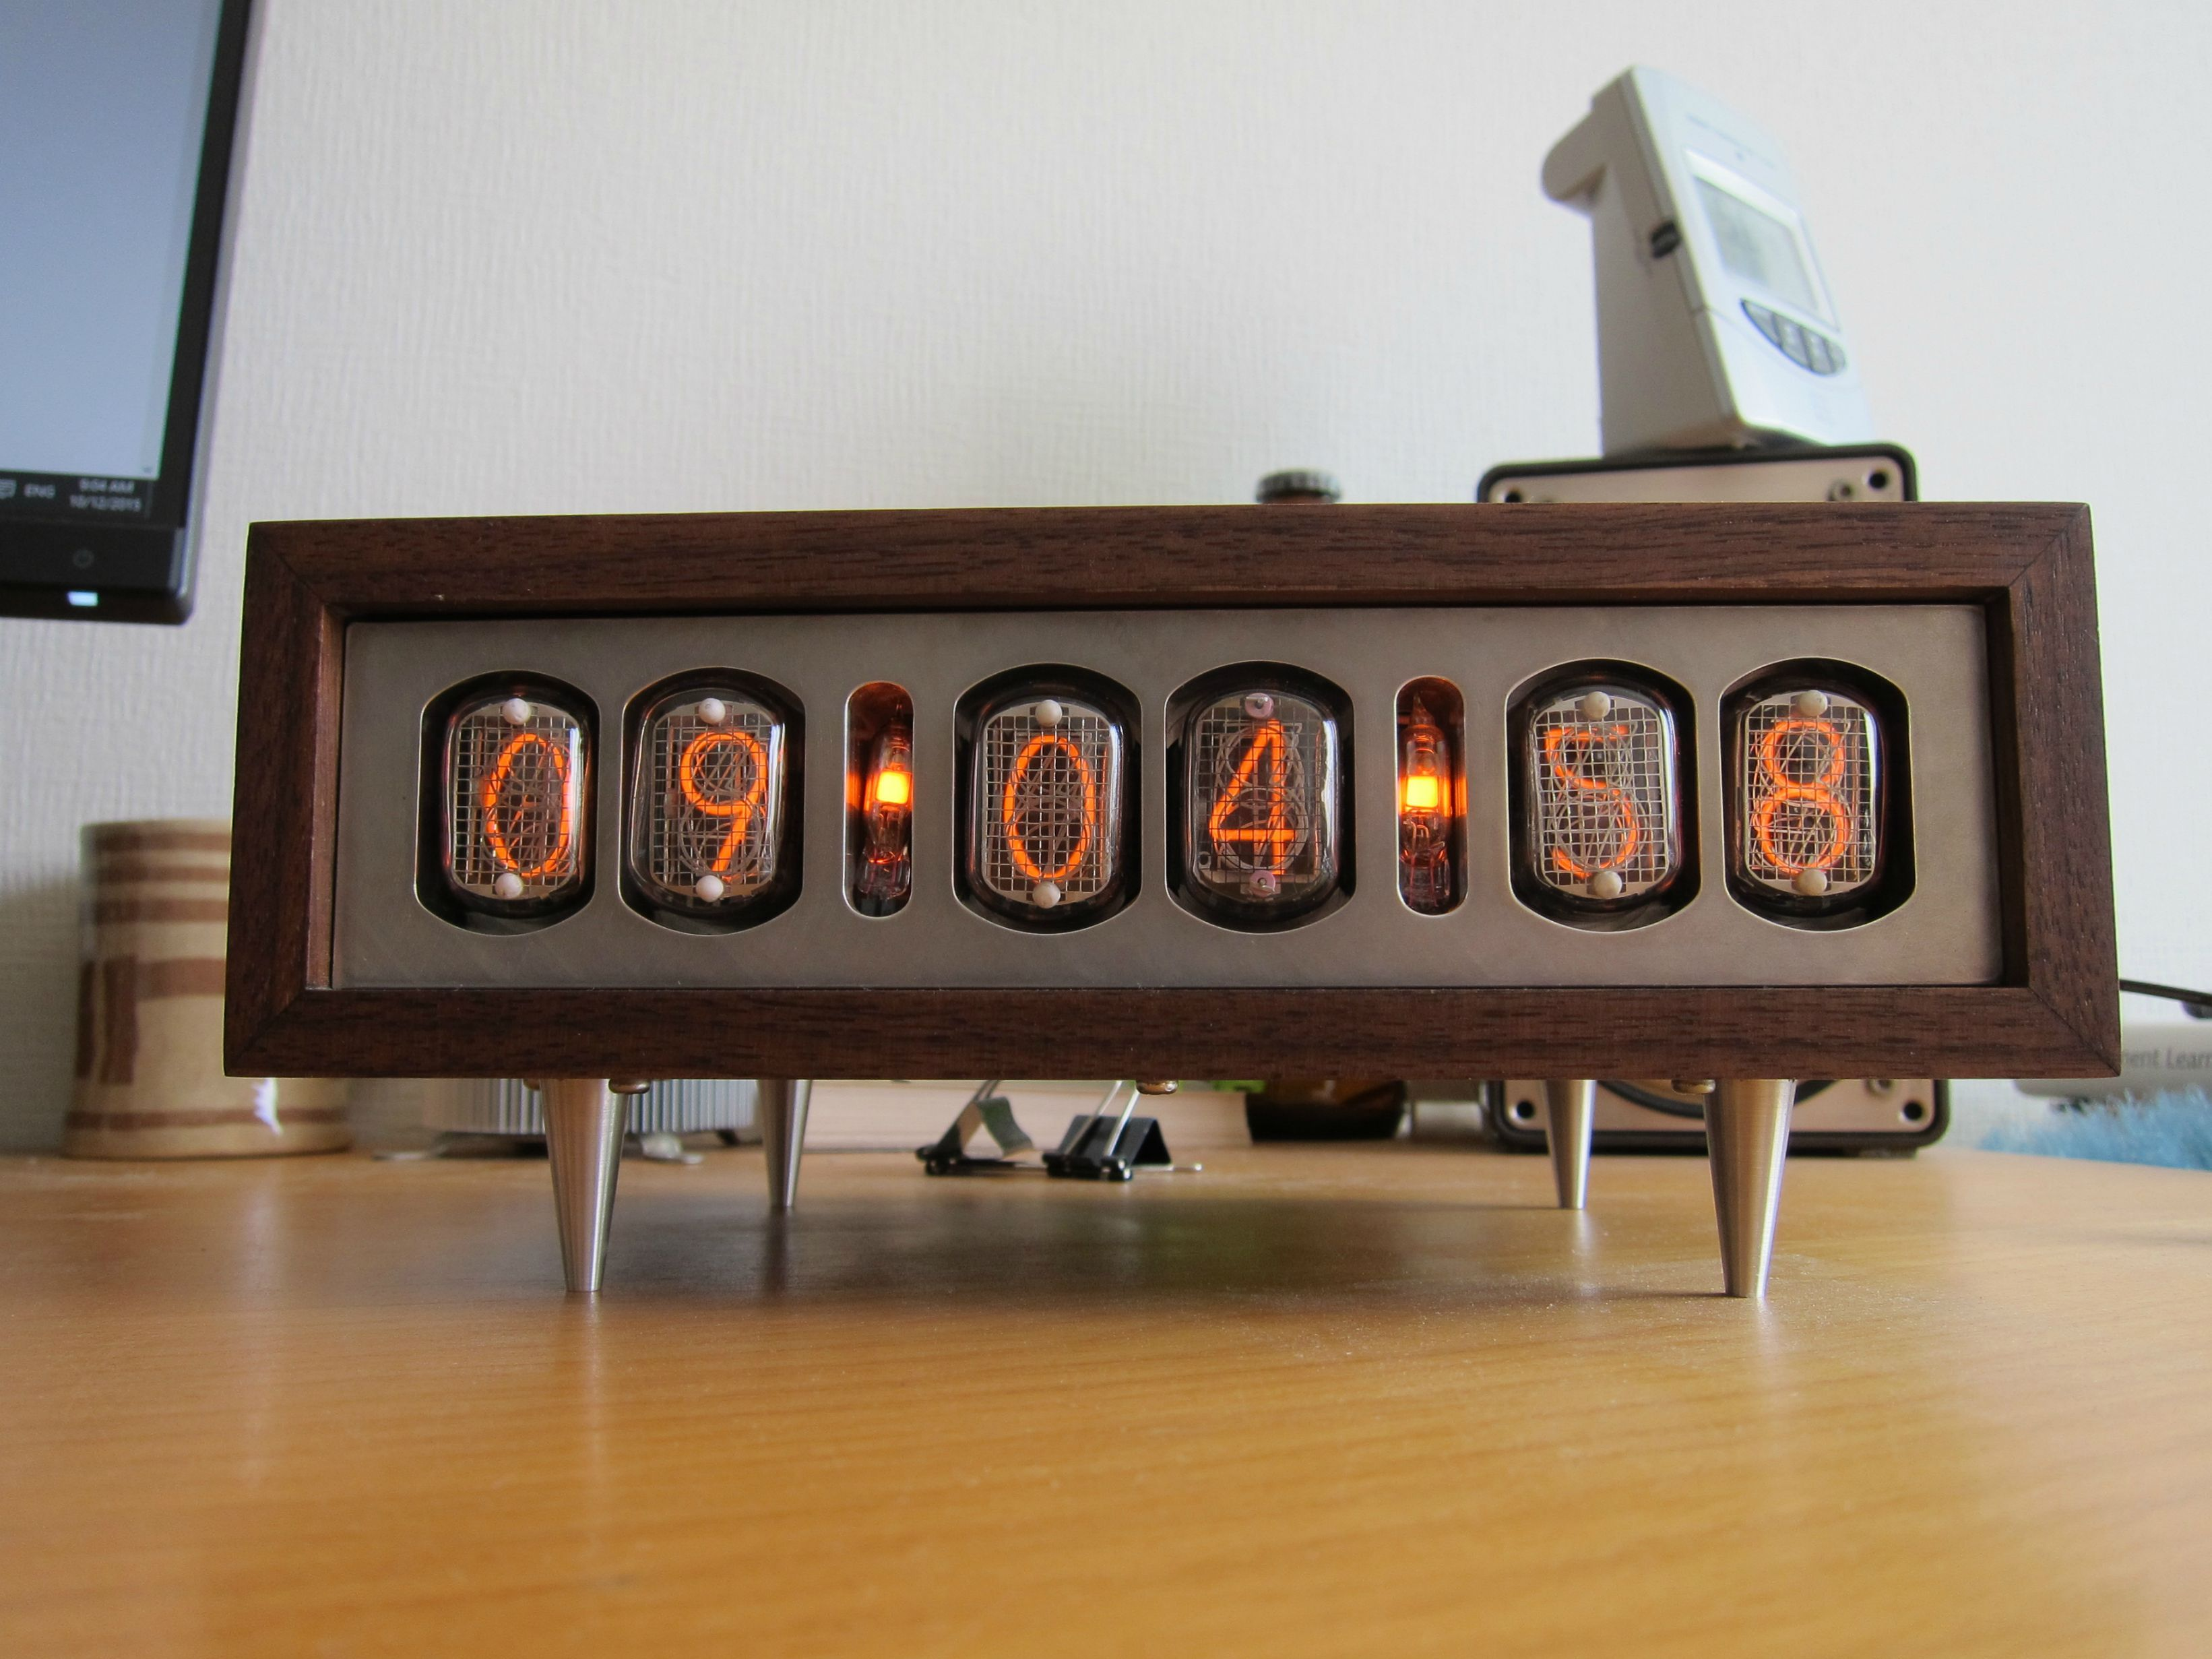 Hyperion nixie tube clock clocks and